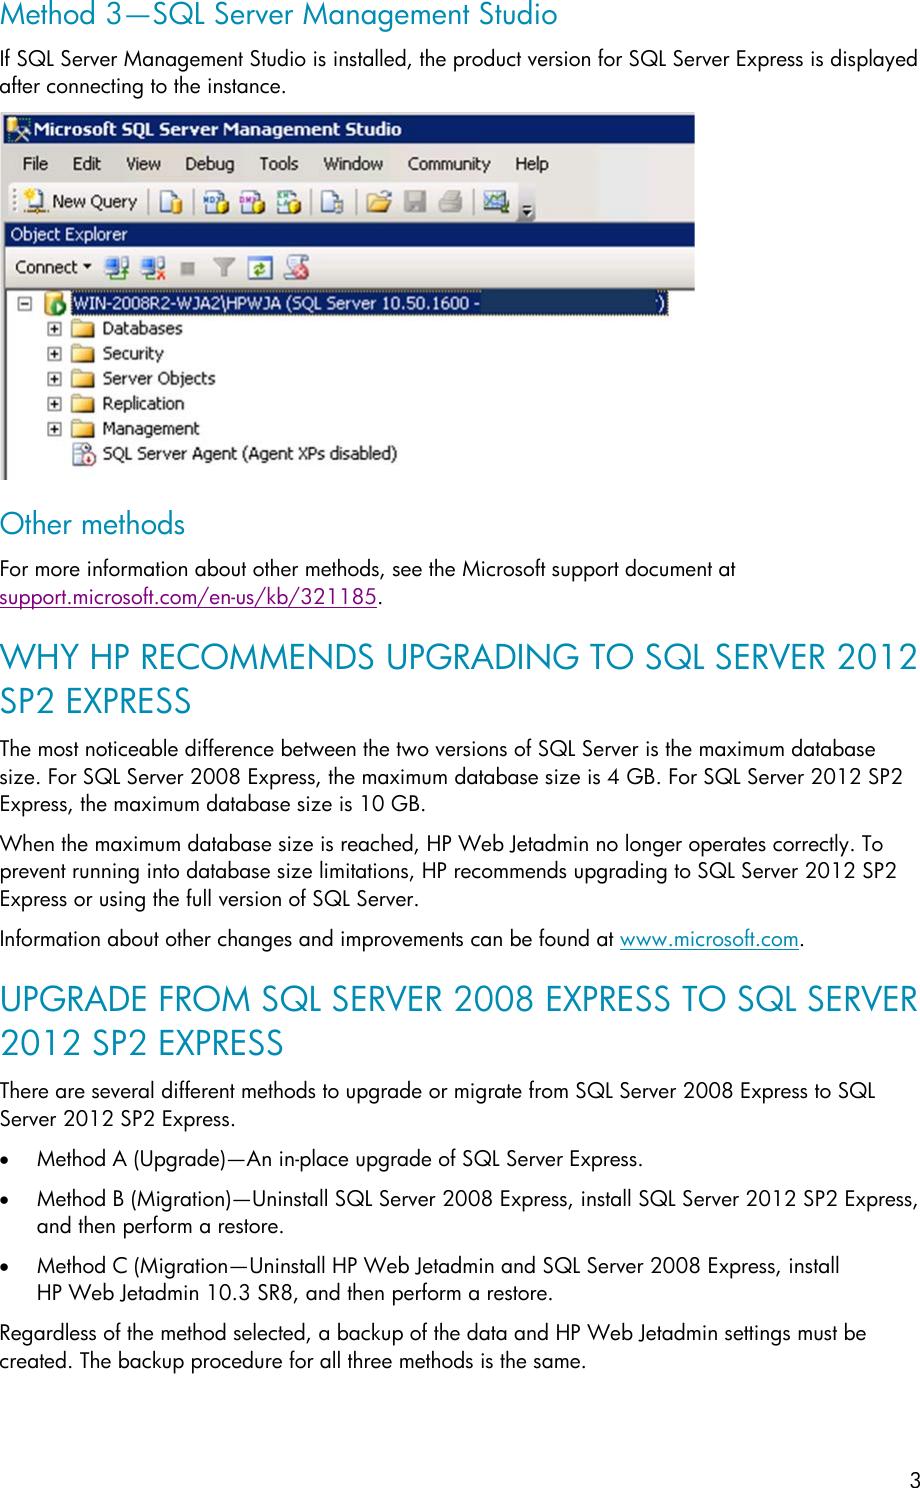 HP Upgrade Microsoft SQL Server Express For Web Jetadmin